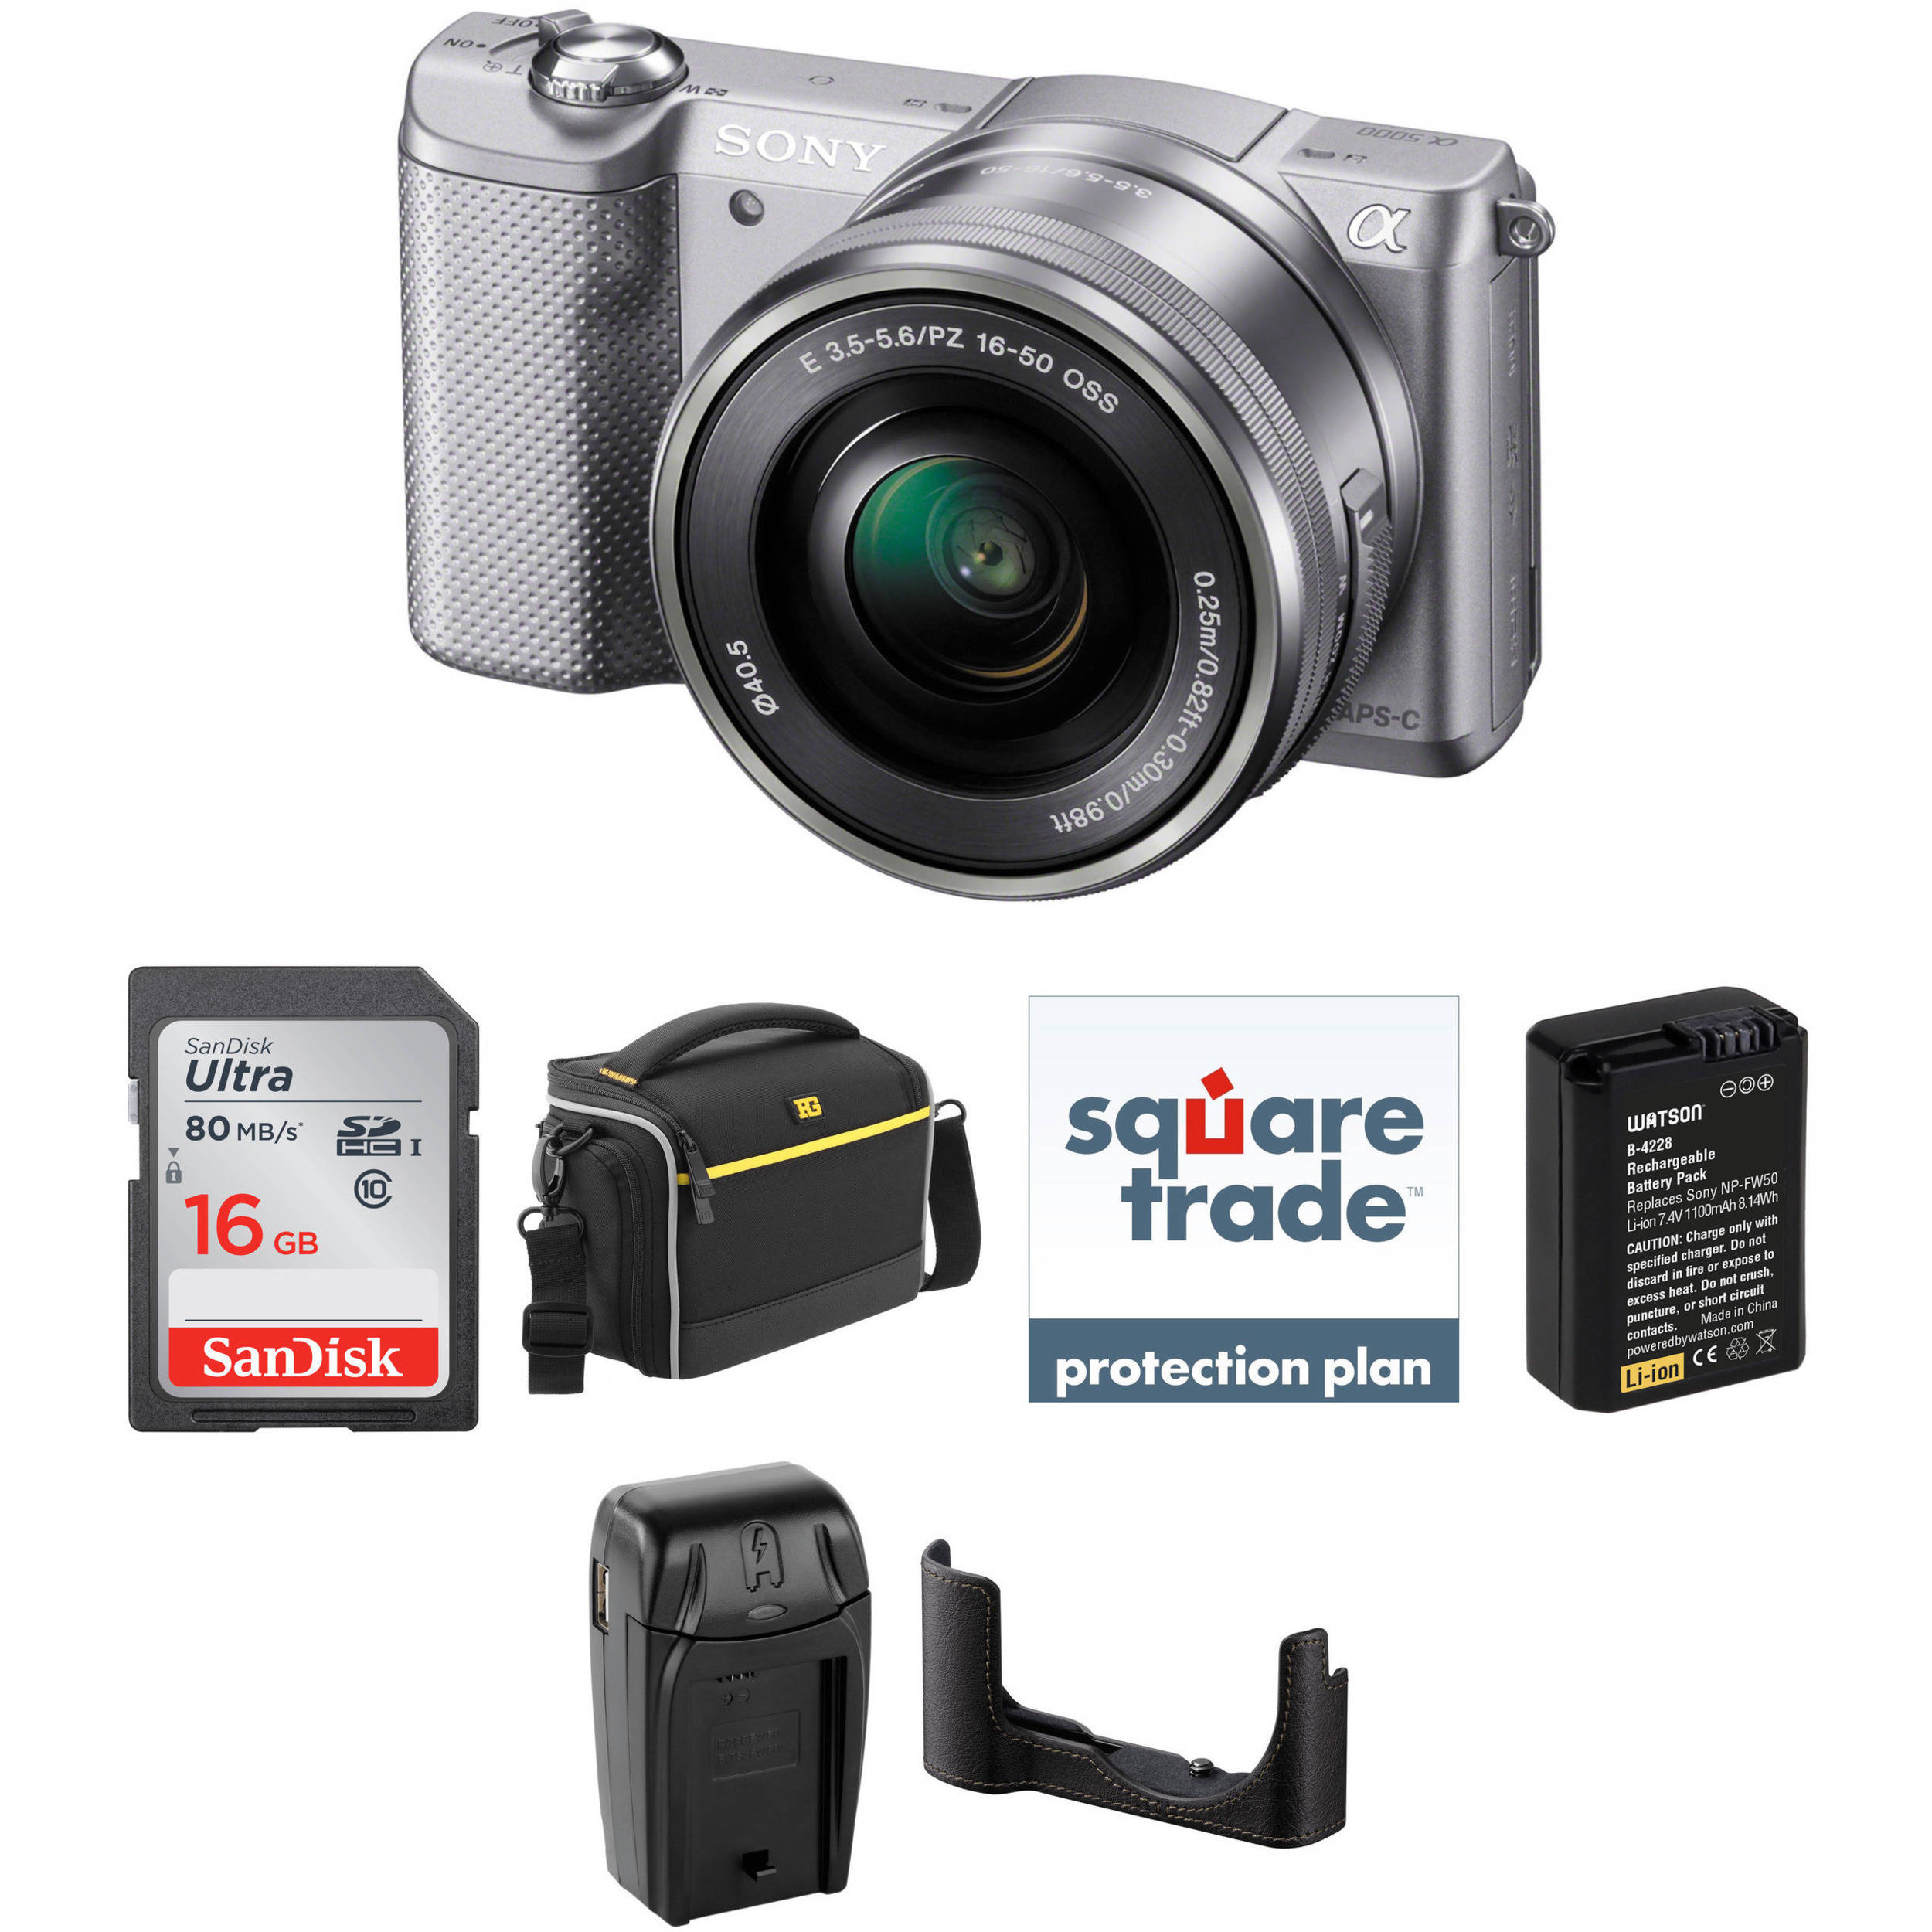 Camera Sony Alpha A5000: reviews, examples of photos. Sony Alpha A5000 Kit: reviews